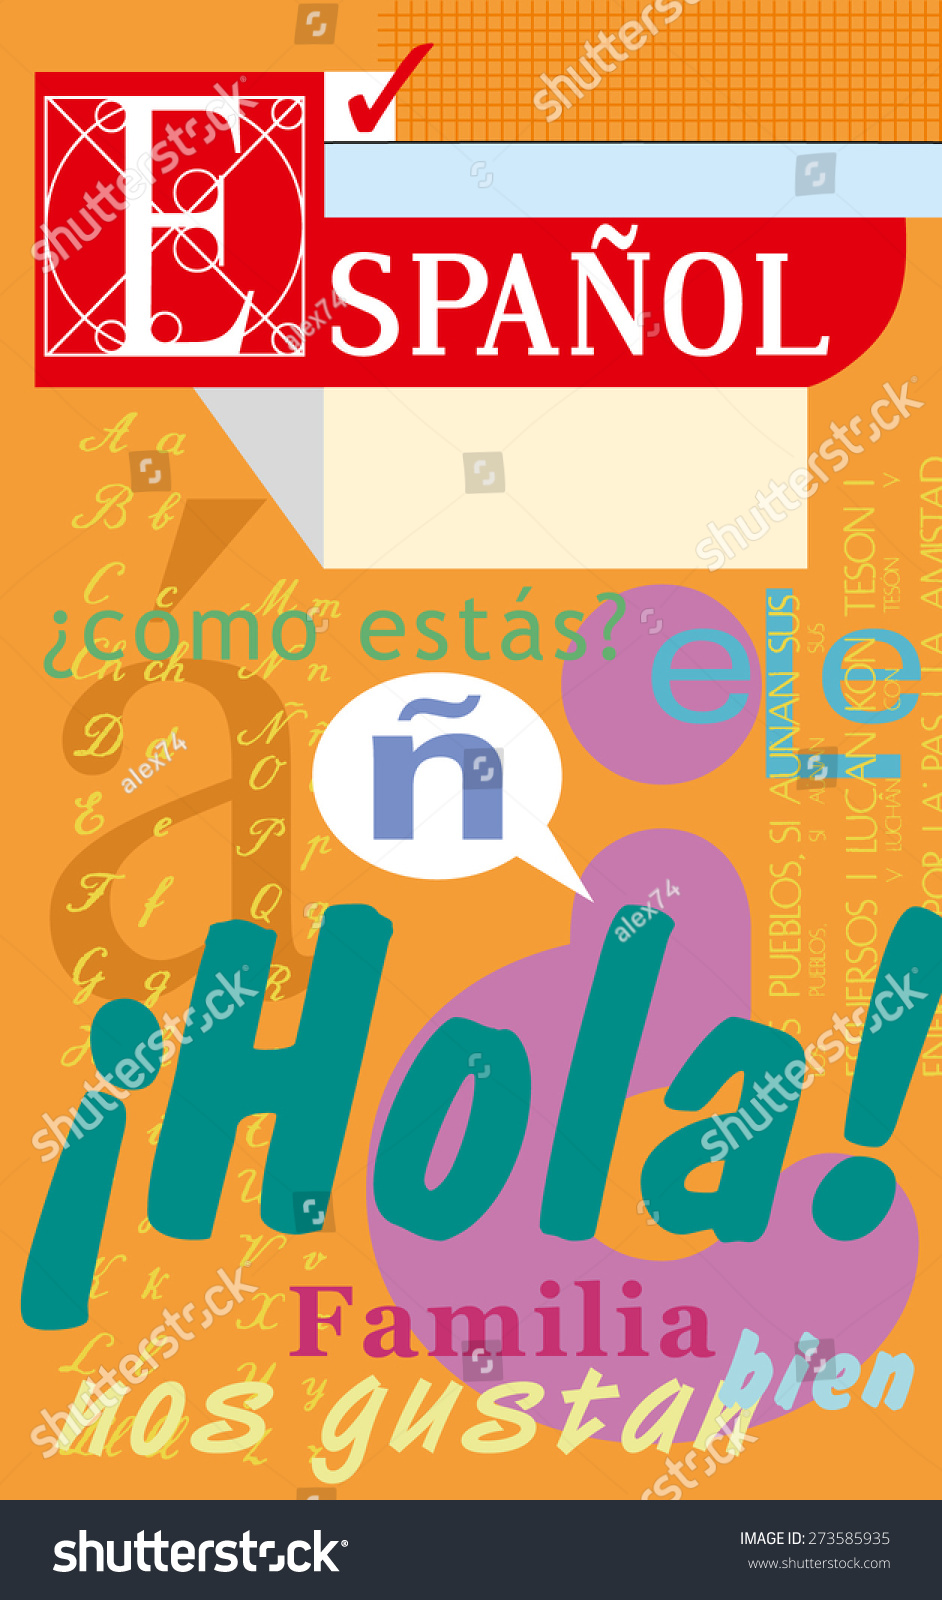 Workbooks spanish language workbooks : Spanish Language Textbook Notebook Vector Typographics Stock ...